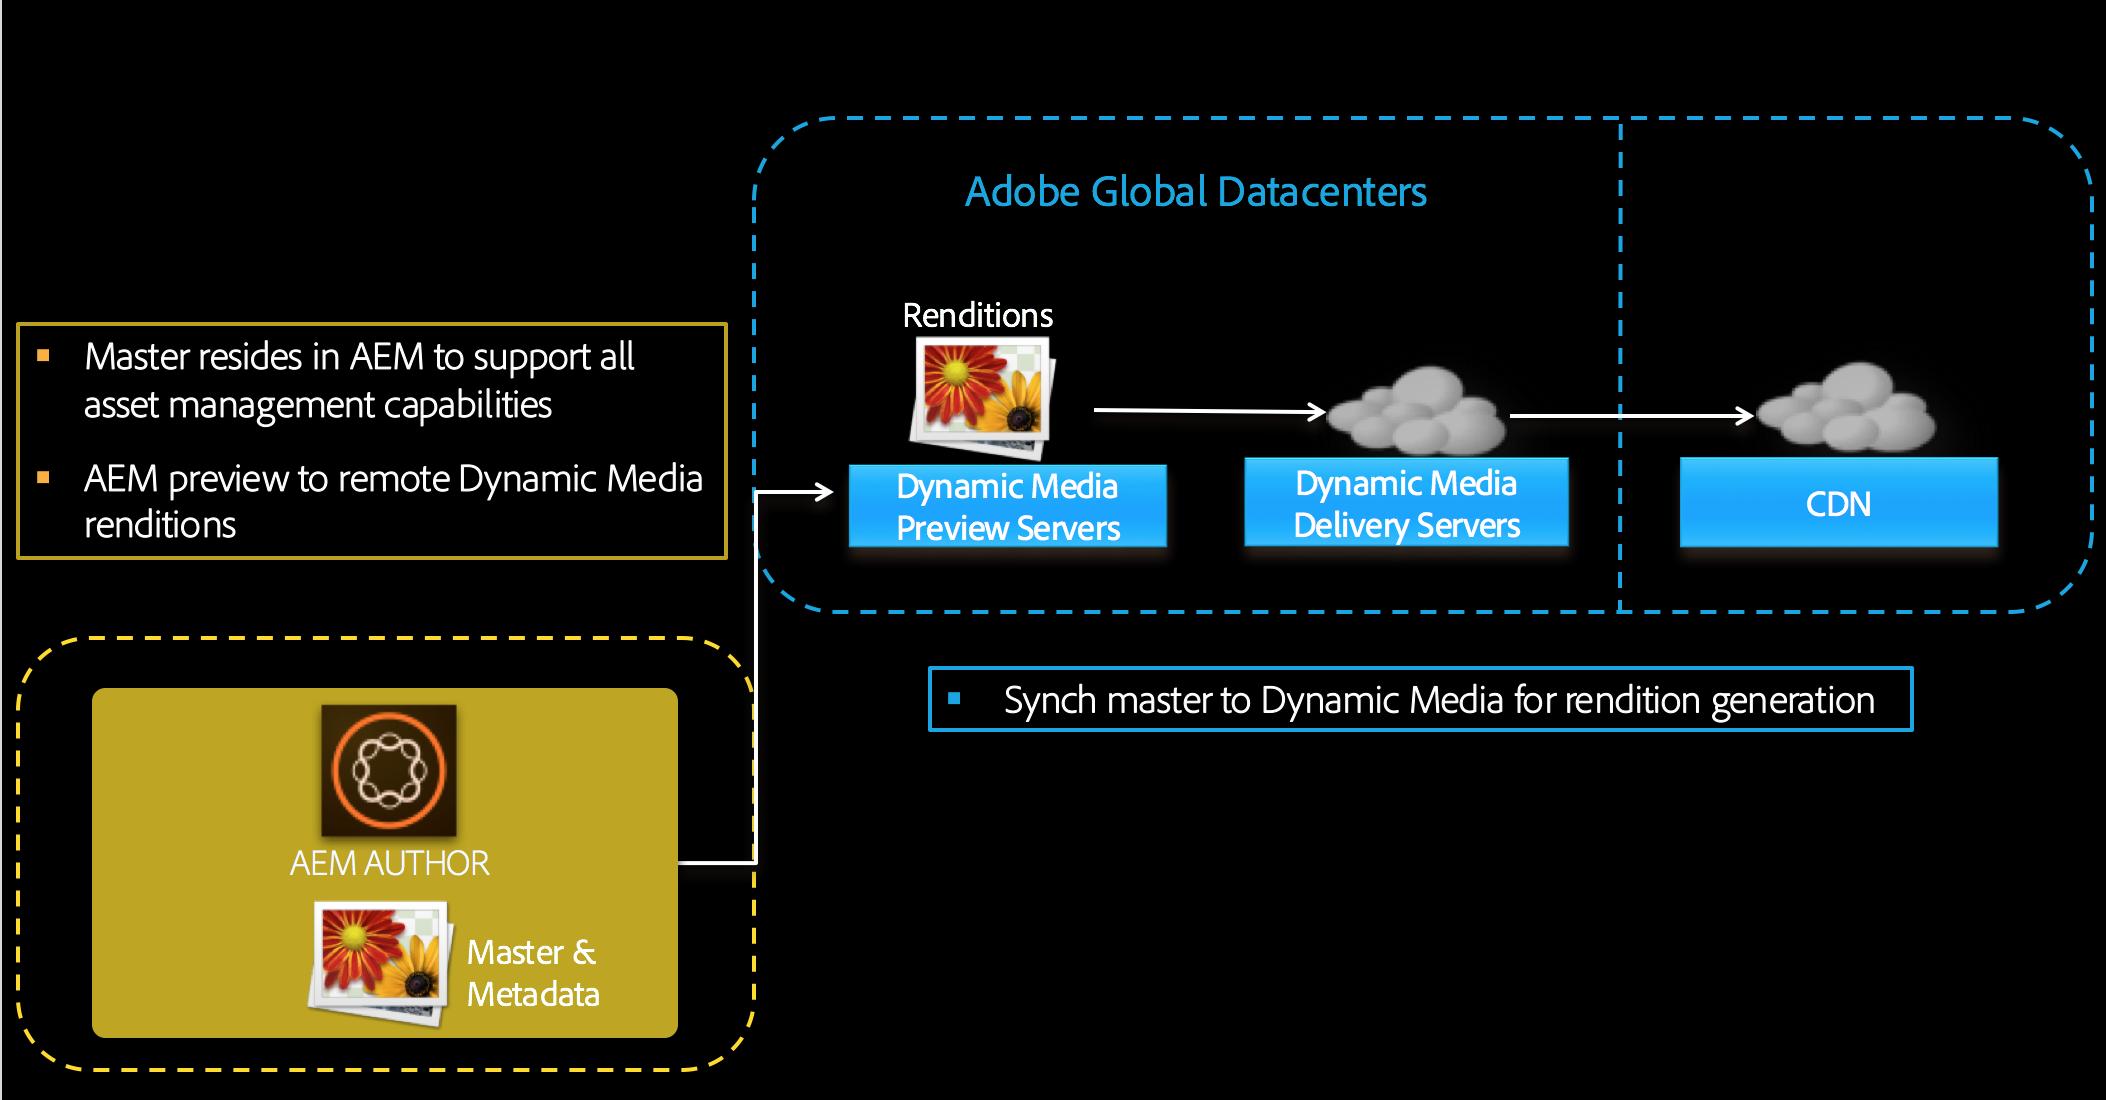 Configuring Dynamic Media - Scene7 mode